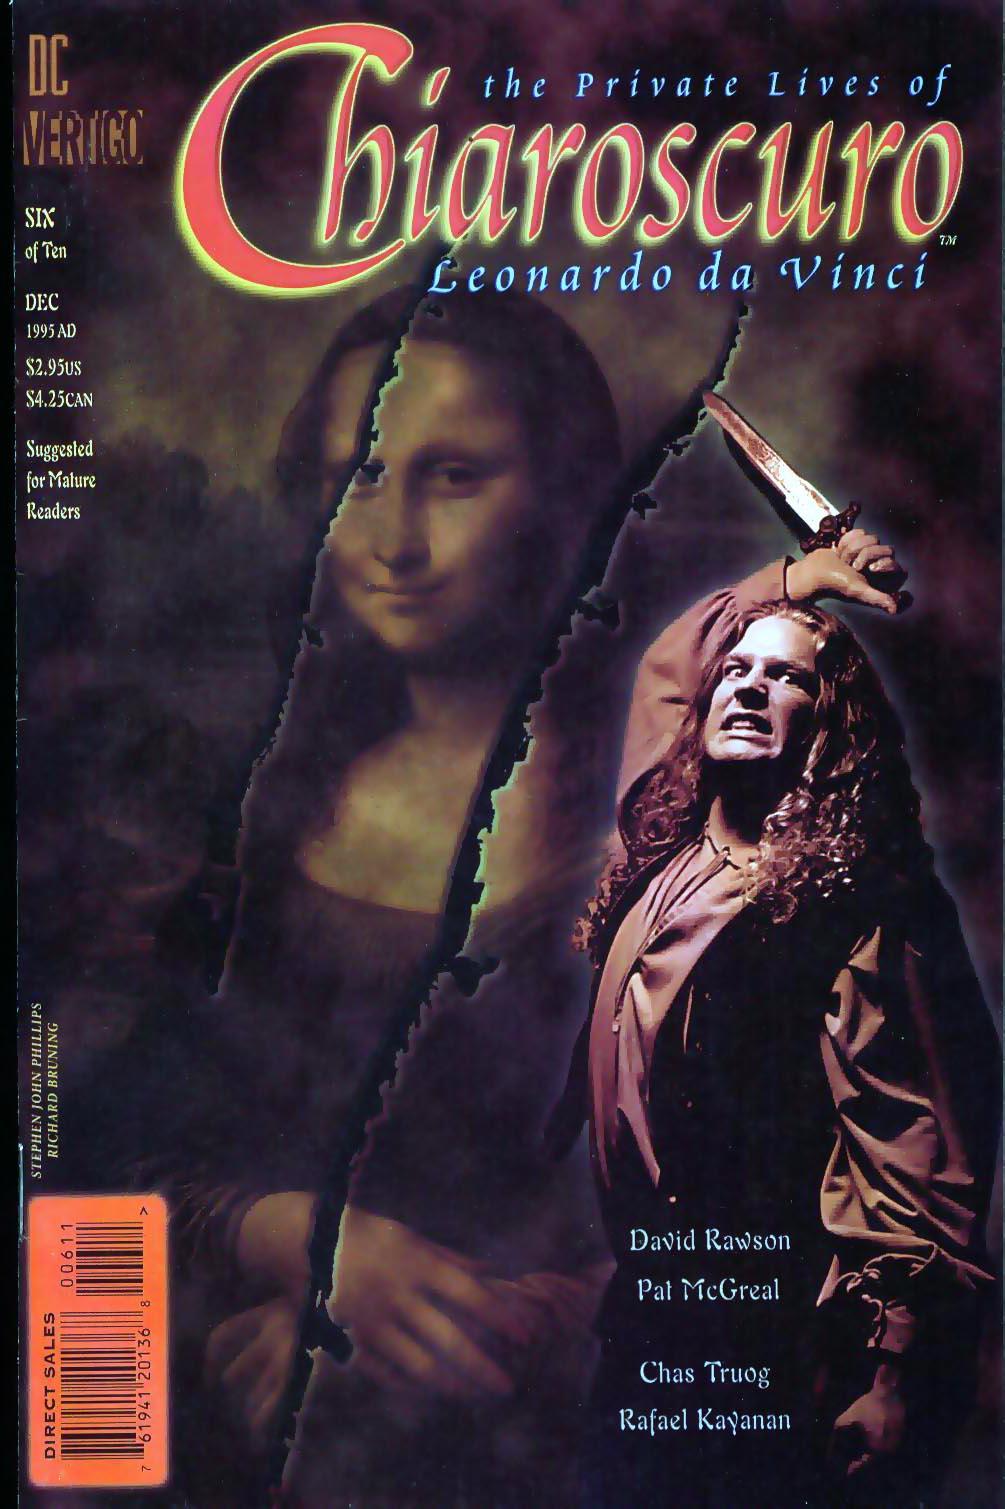 chiaroscuro book 6 beloved objects the private lives of leonardo da vinci volume 1